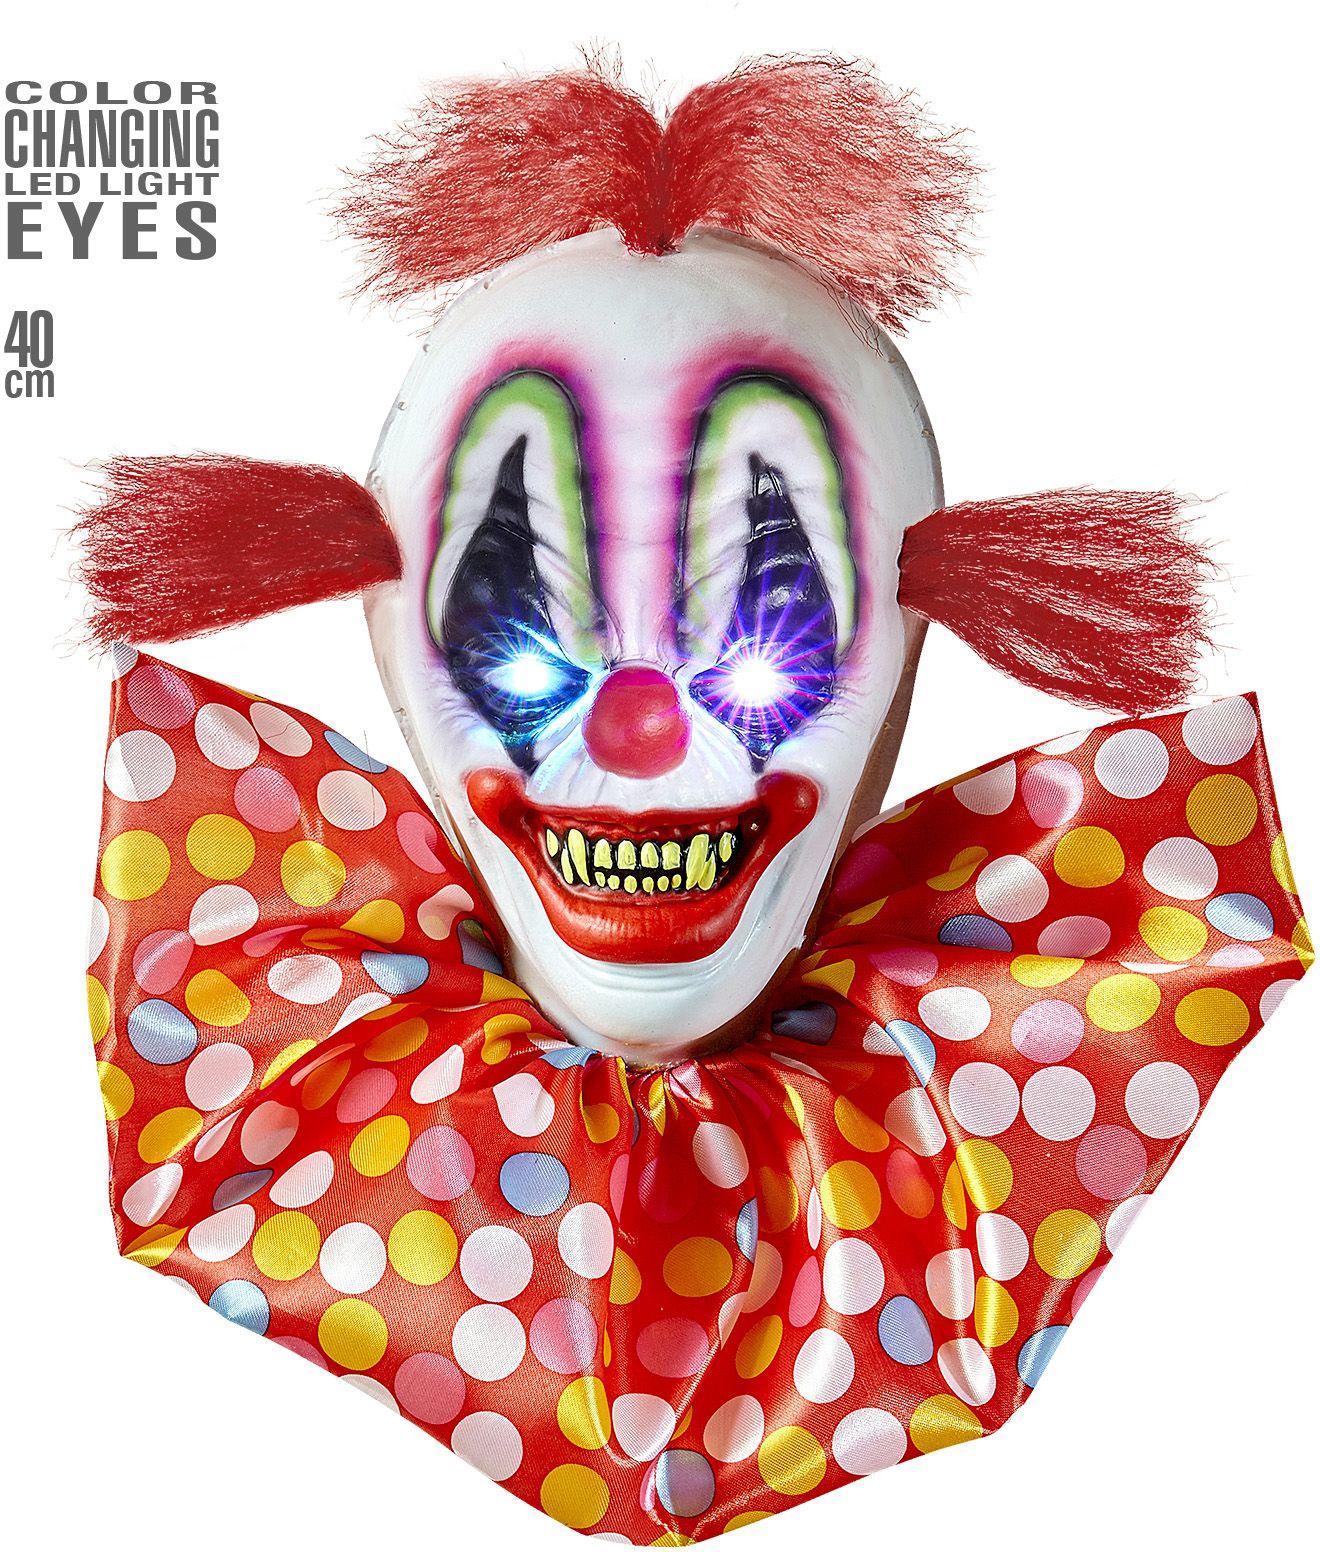 Enge clown decoratie